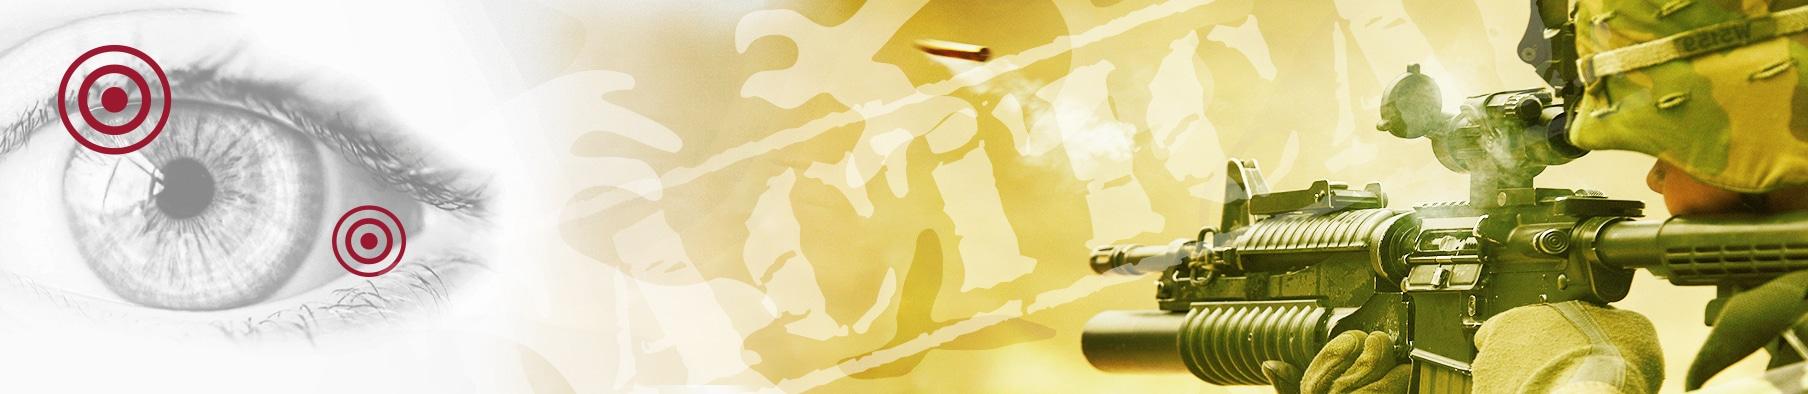 2019-04 banner tactical Militar